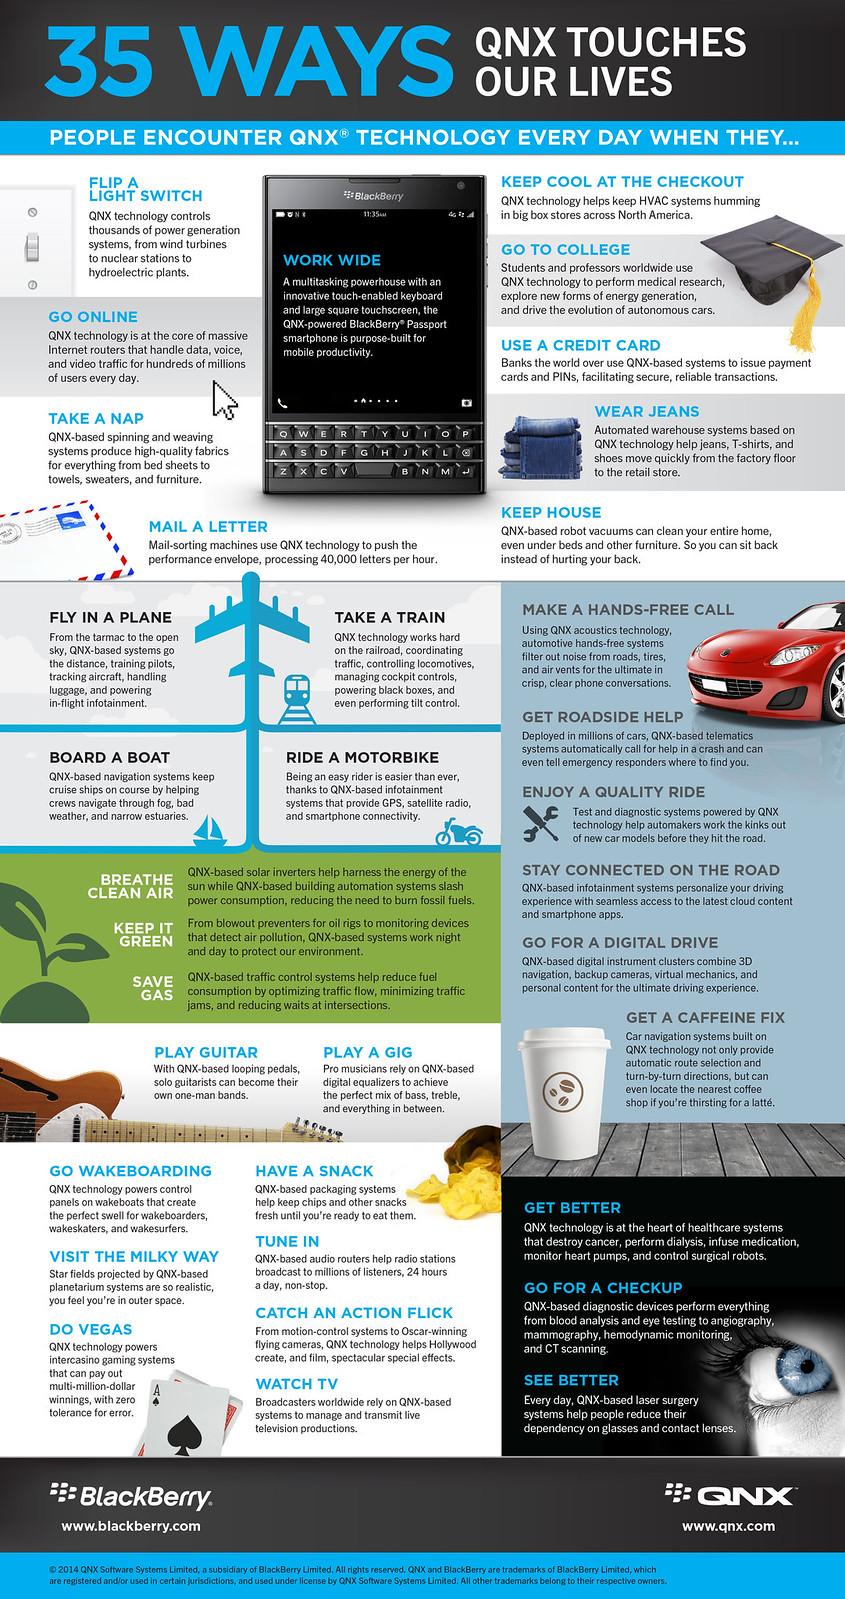 QNX-35Ways-Infographic